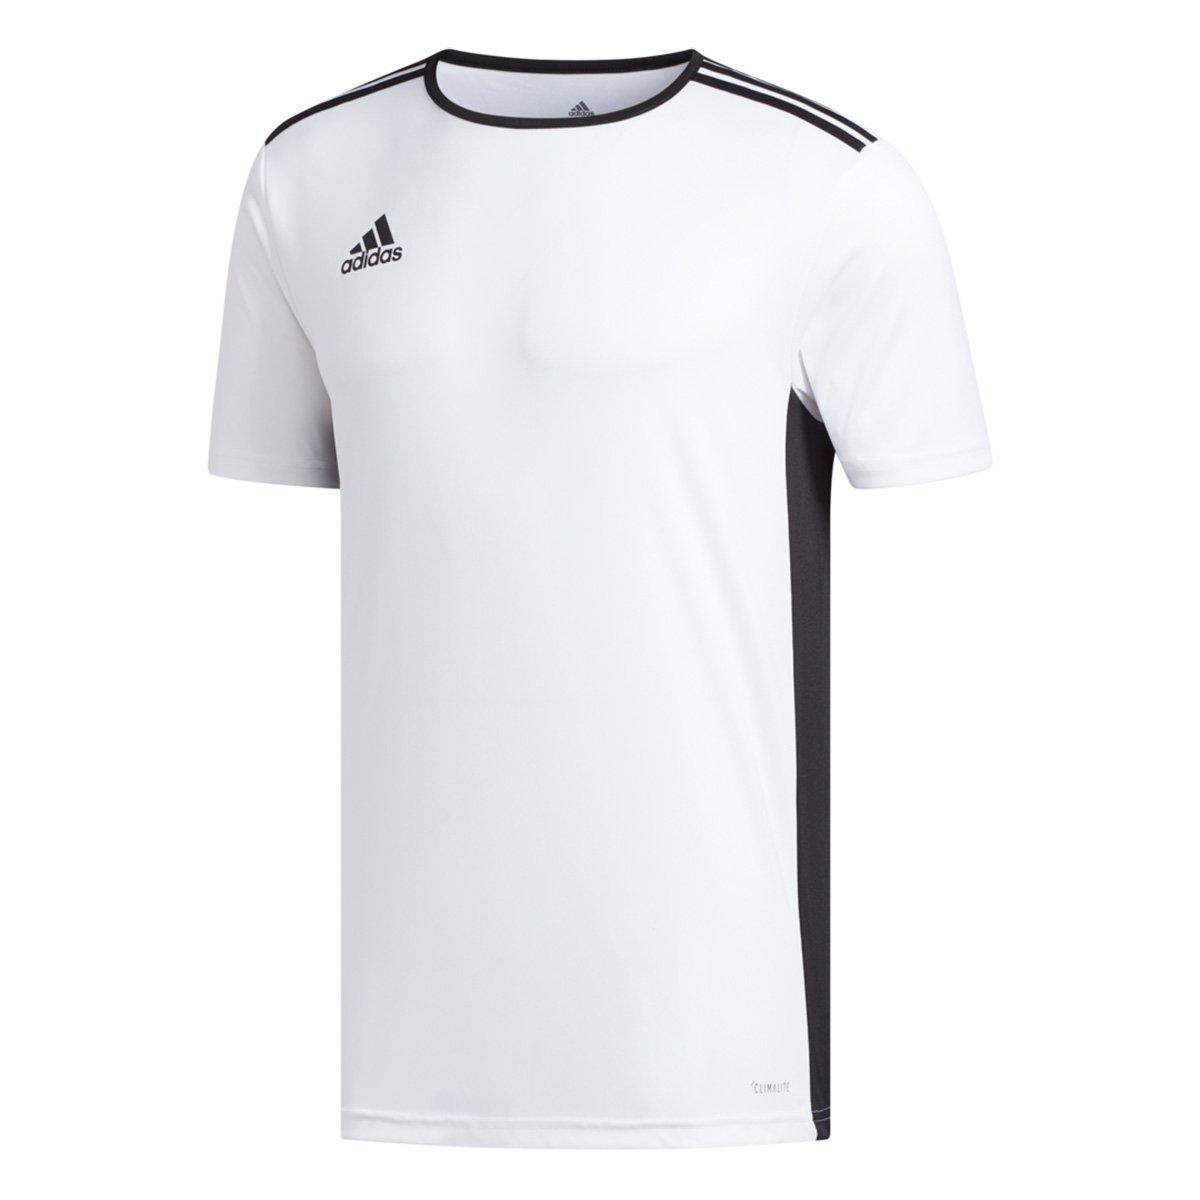 Camiseta Adidas Entrada 18 Masculina - Branco e Preto - Compre Agora ... 6a630c0675f